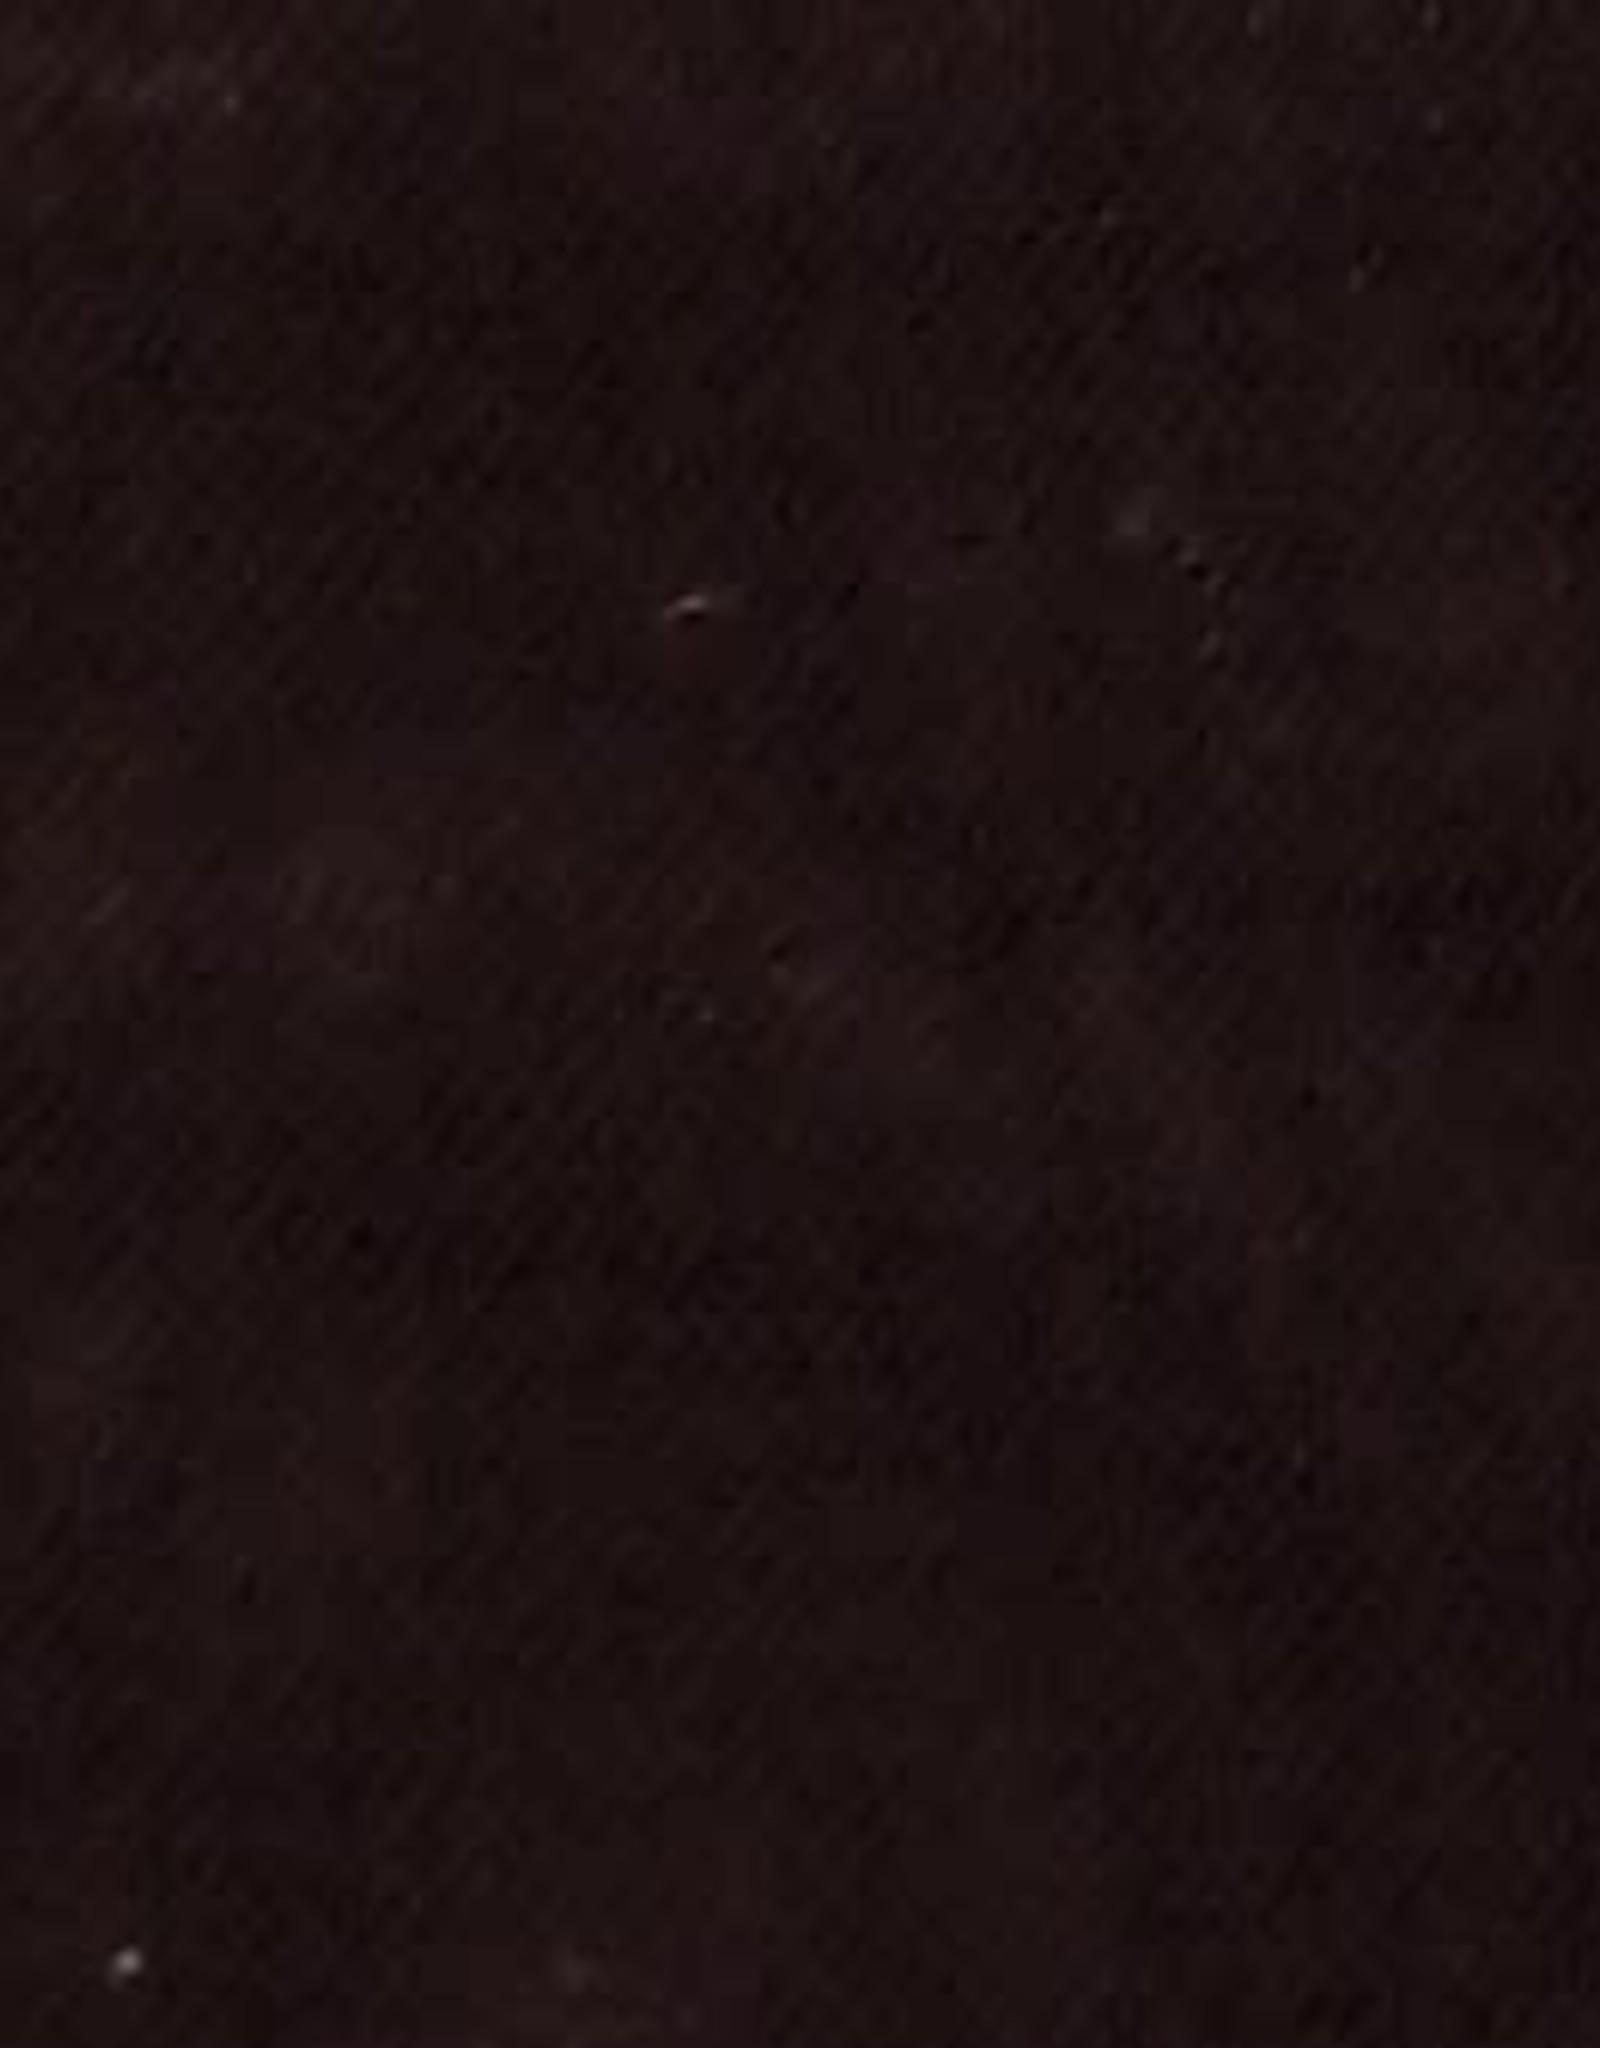 Chiffon 58 - 60 Inches Dark Brown #13 (Yard)